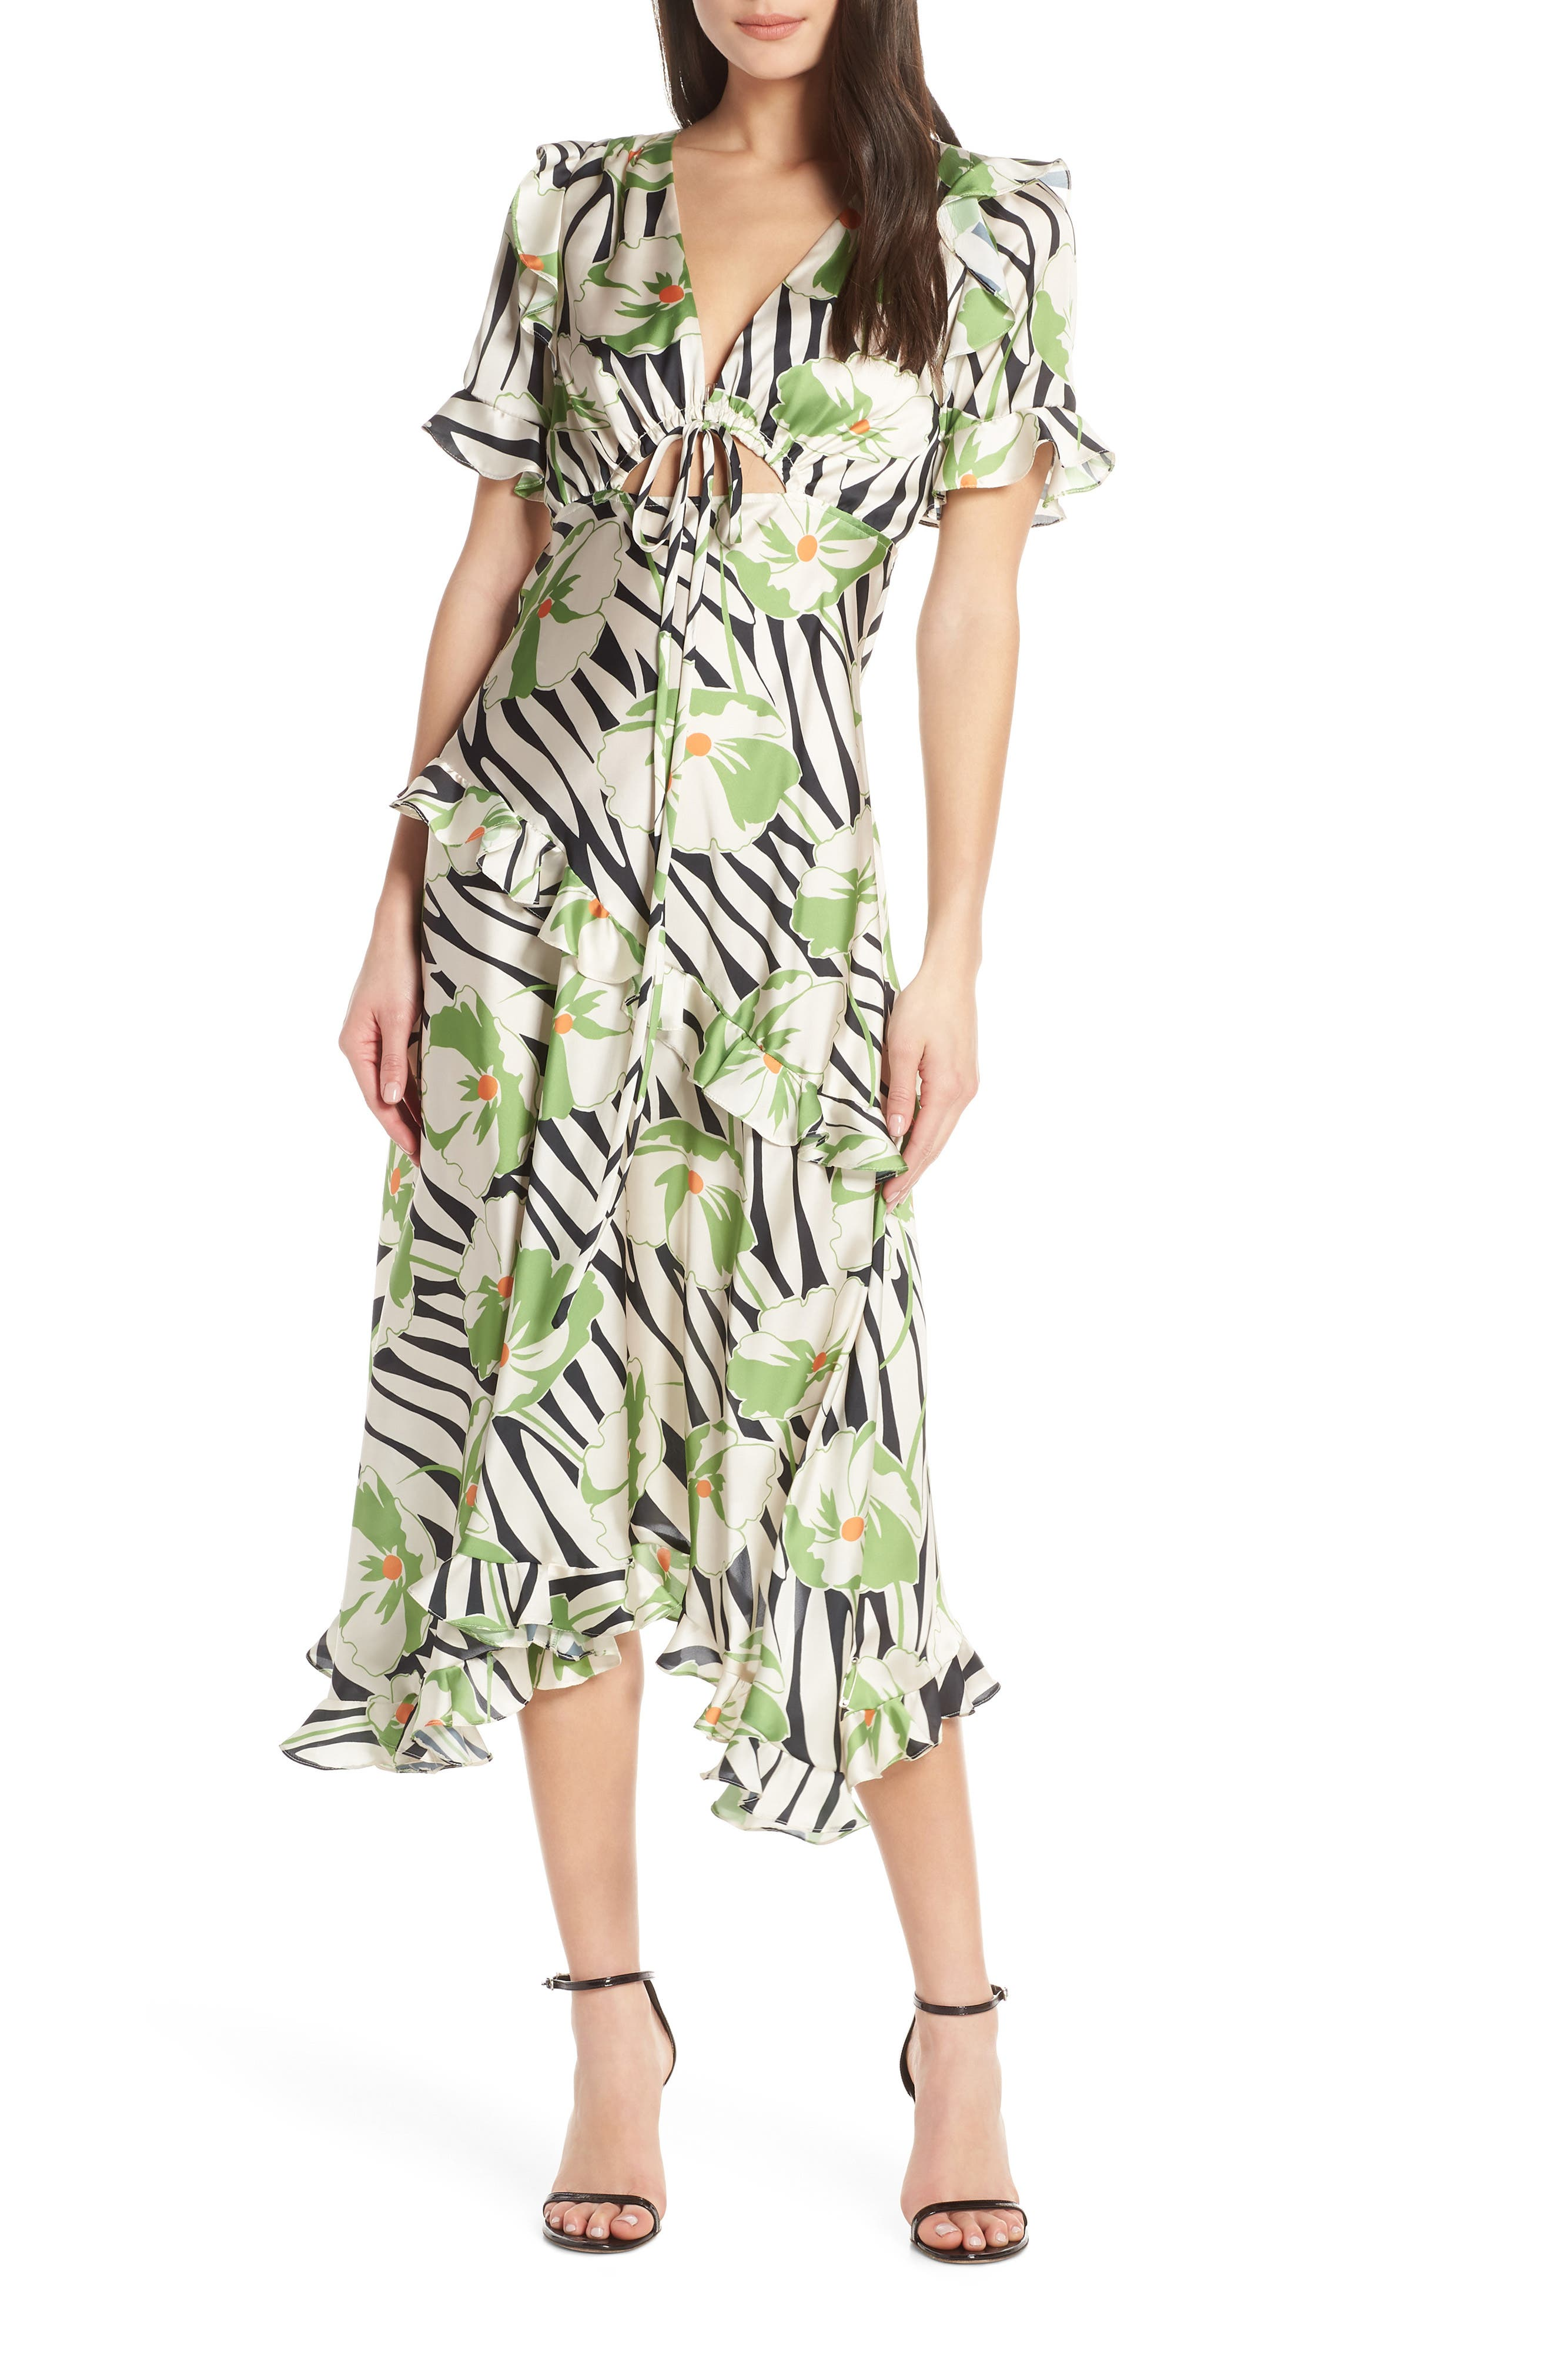 Jill Jill Stuart Tropical Print Ruffle Dress, Green